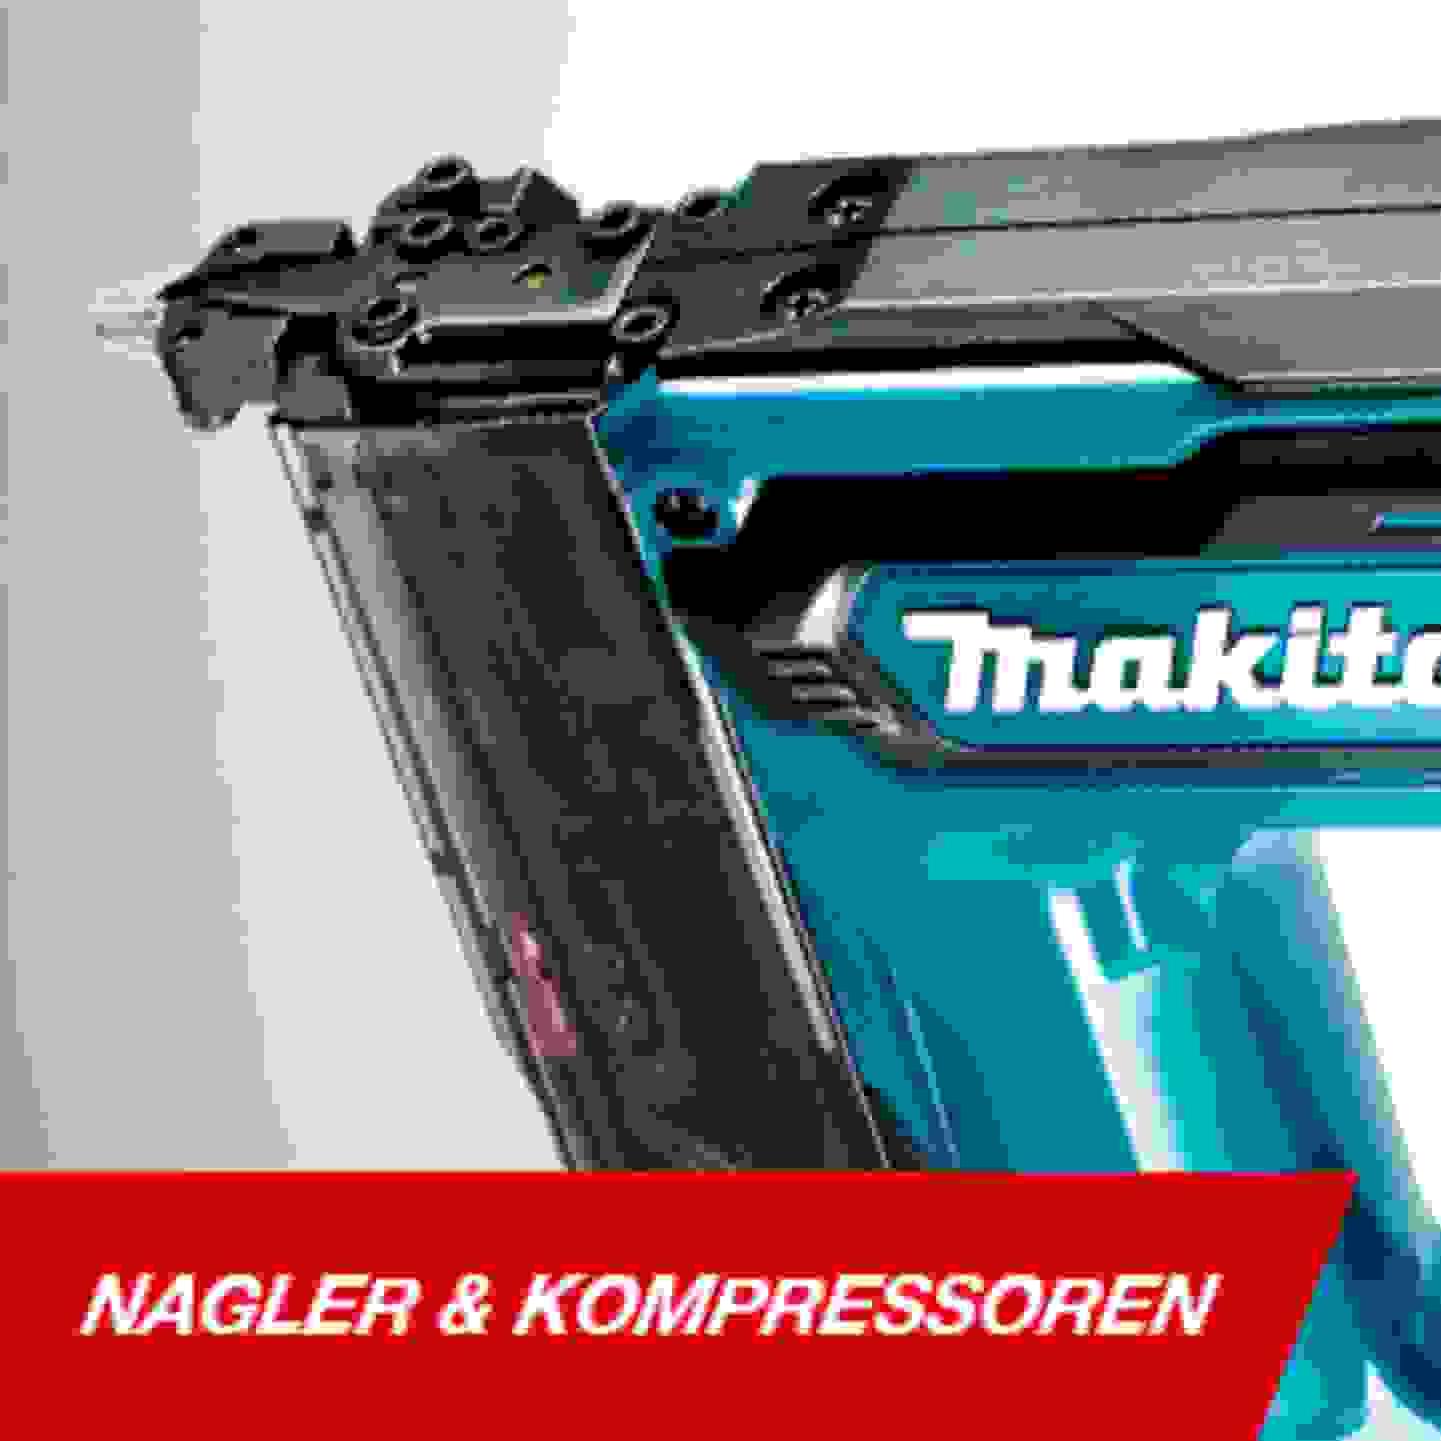 Nagler & Kompressoren